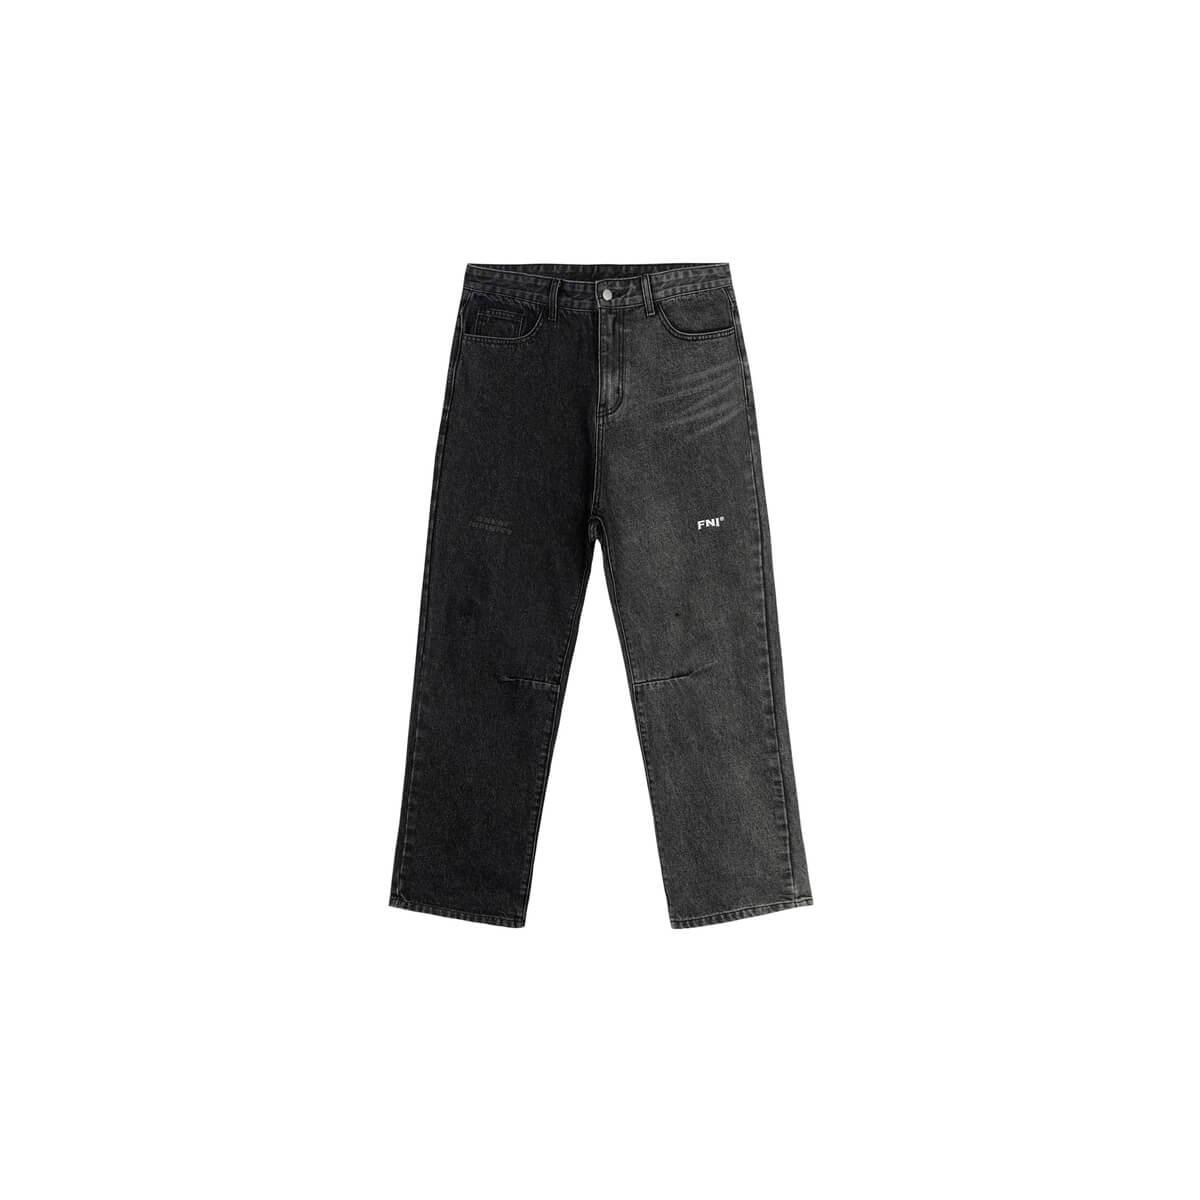 Джинсы DL Studio Signature Blend Jeans Black